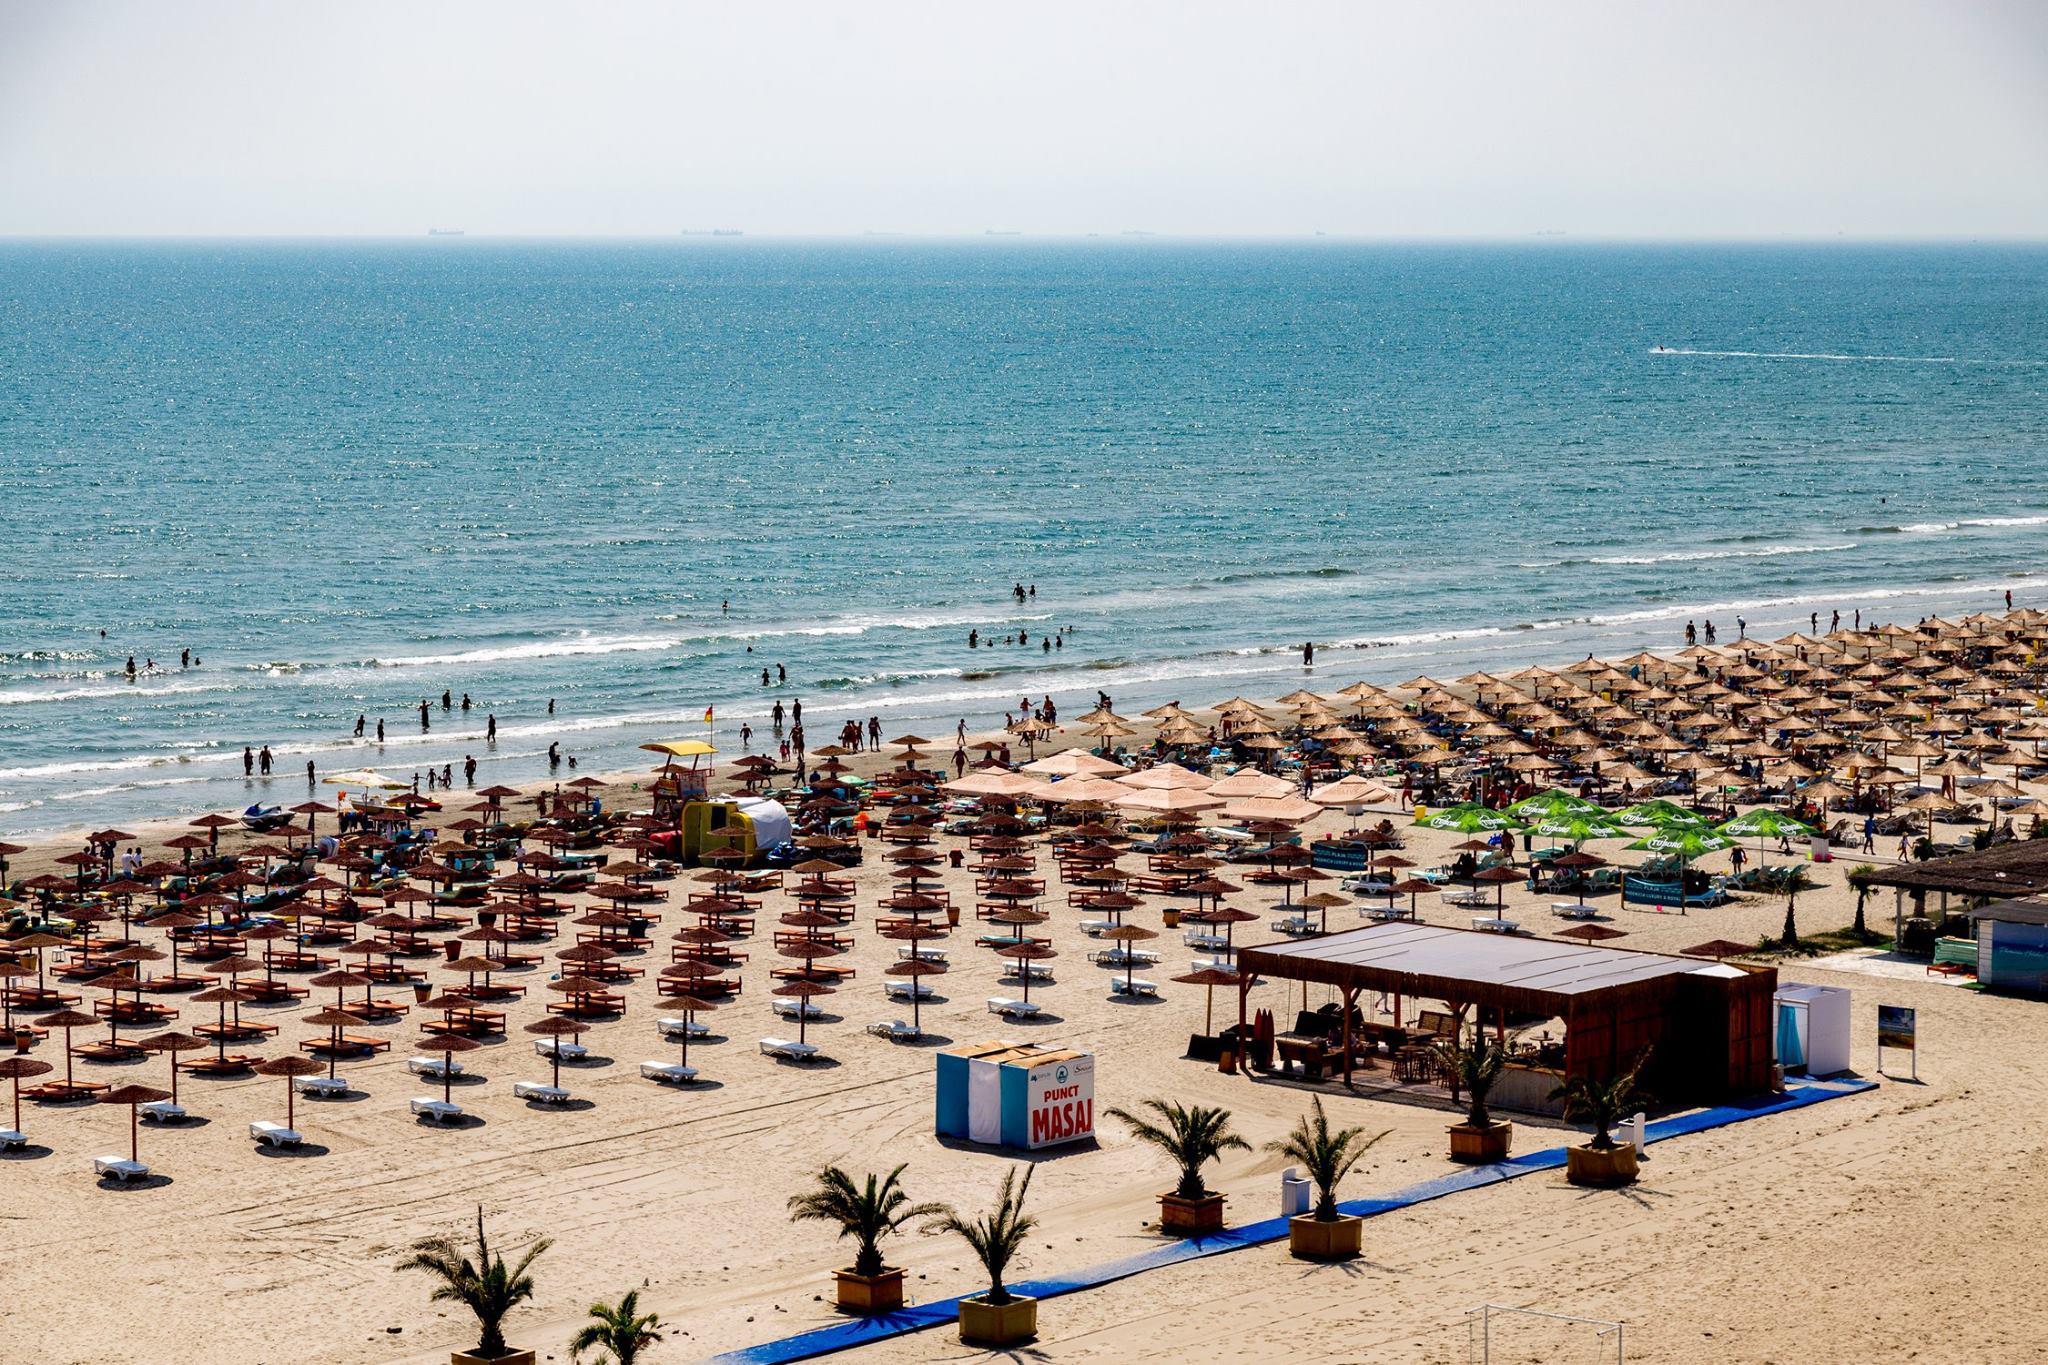 Plaja Phoenicia Resort